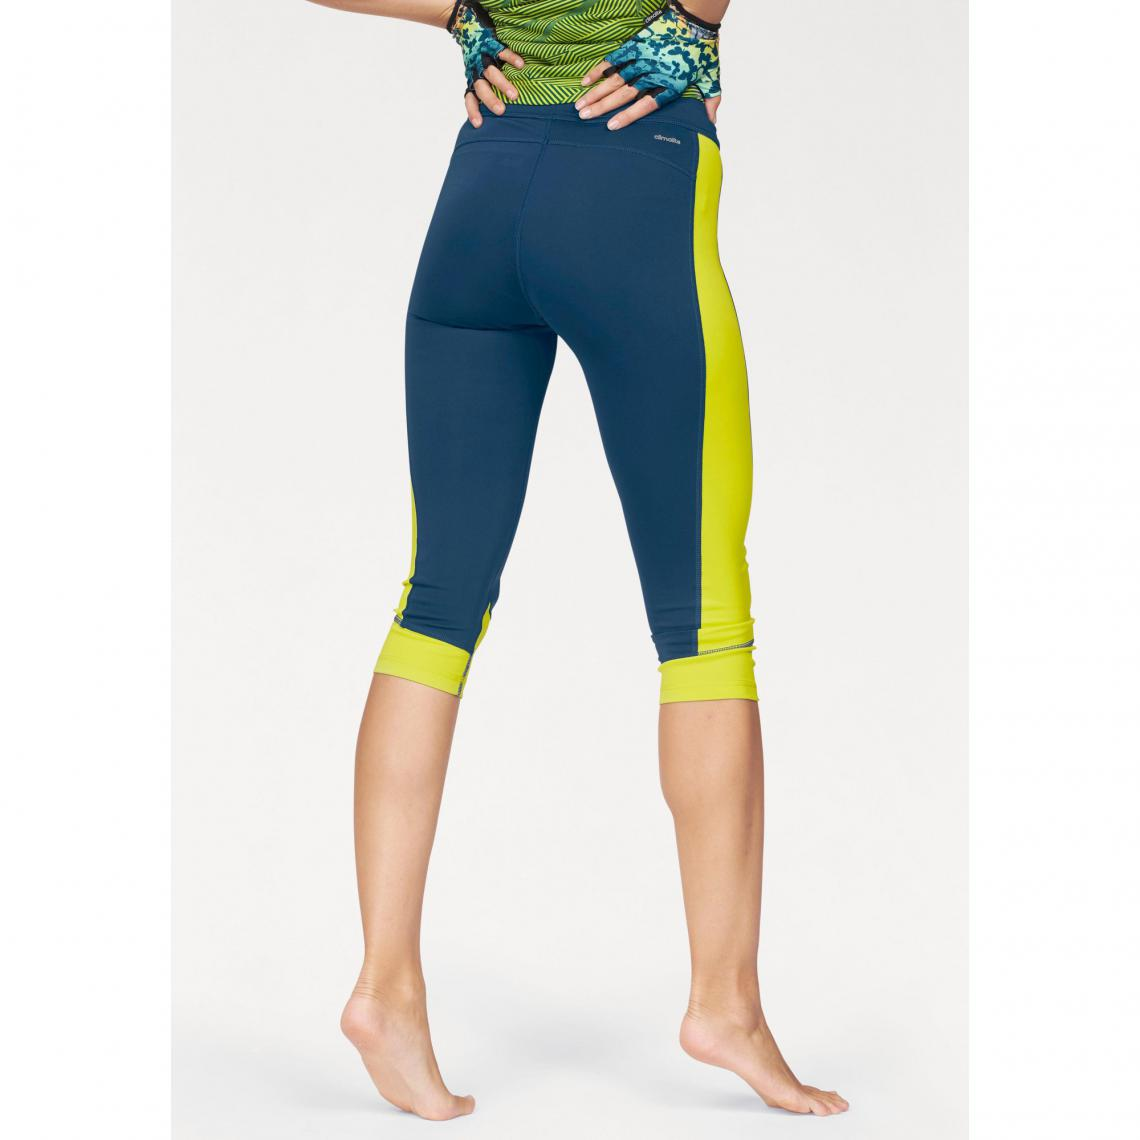 Legging ¾ adidas Performance Techfit Capri femme - Bleu  8e13b9fd124